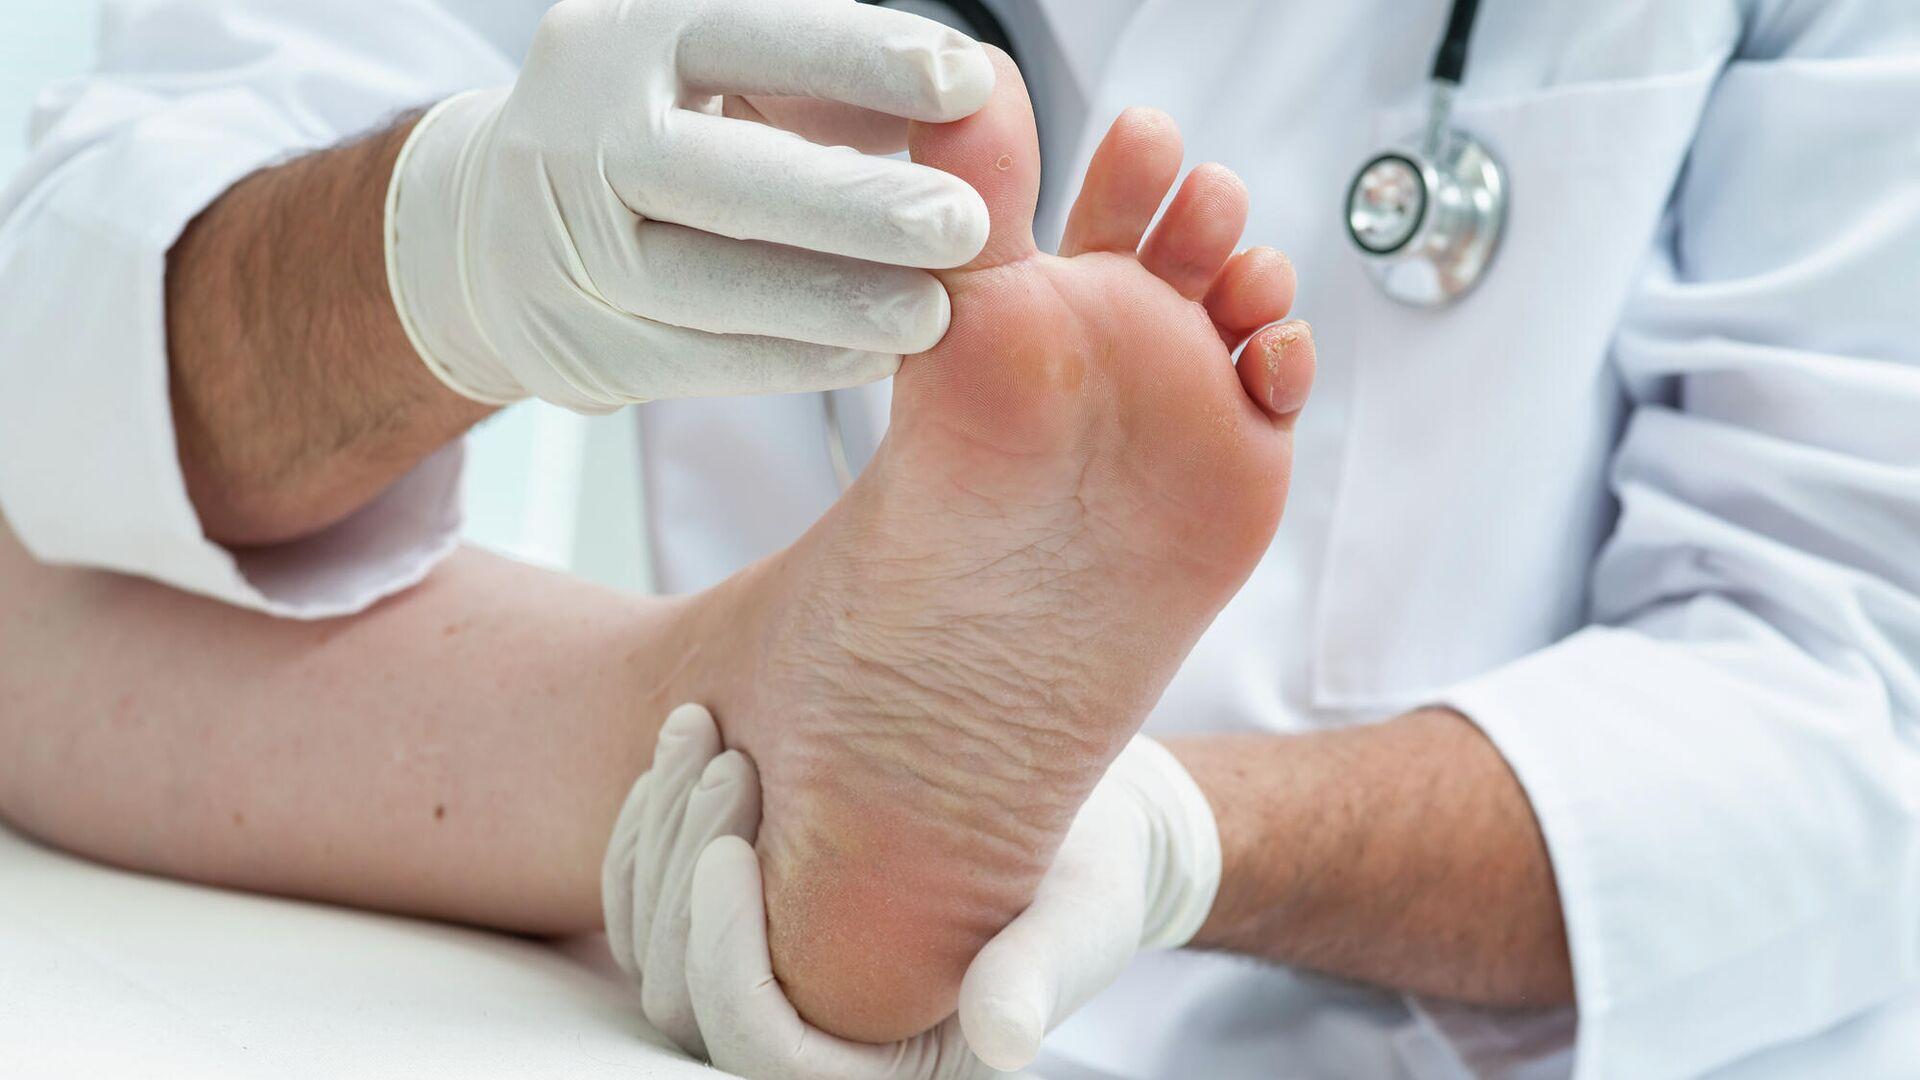 Доктор осматривает ноги пациента - РИА Новости, 1920, 20.07.2021